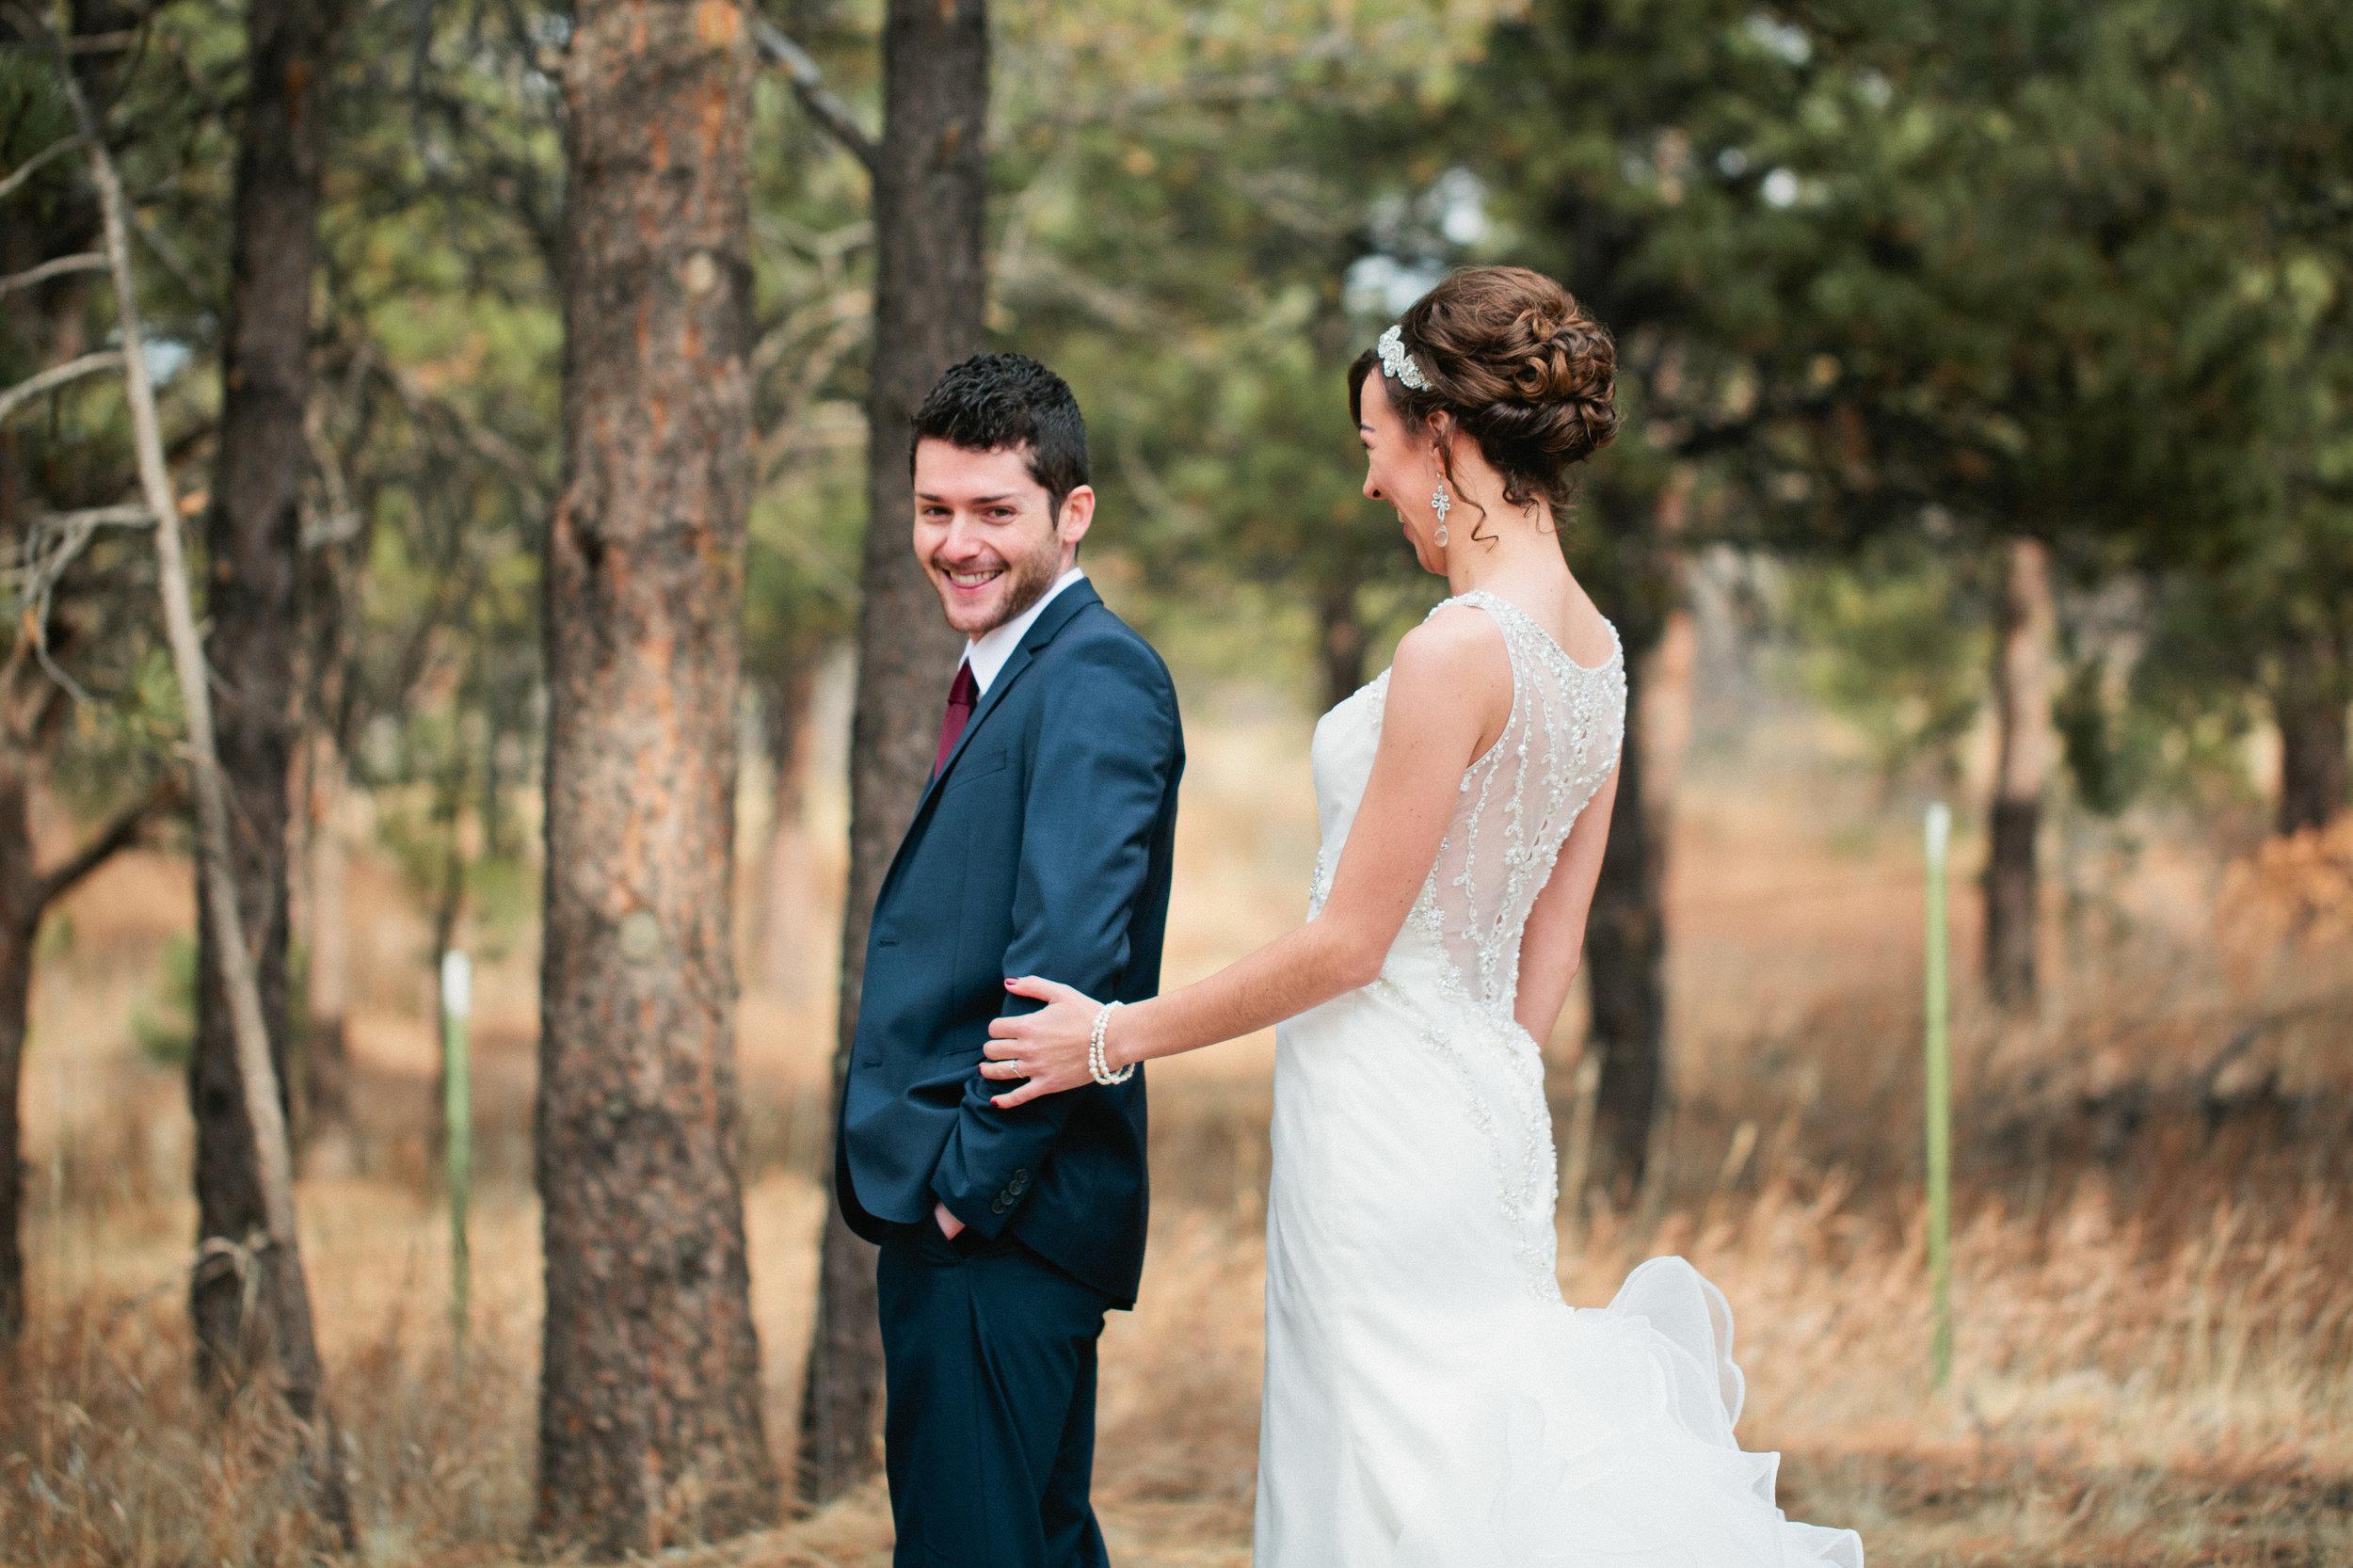 Professional wedding photographers in Colorado Springs